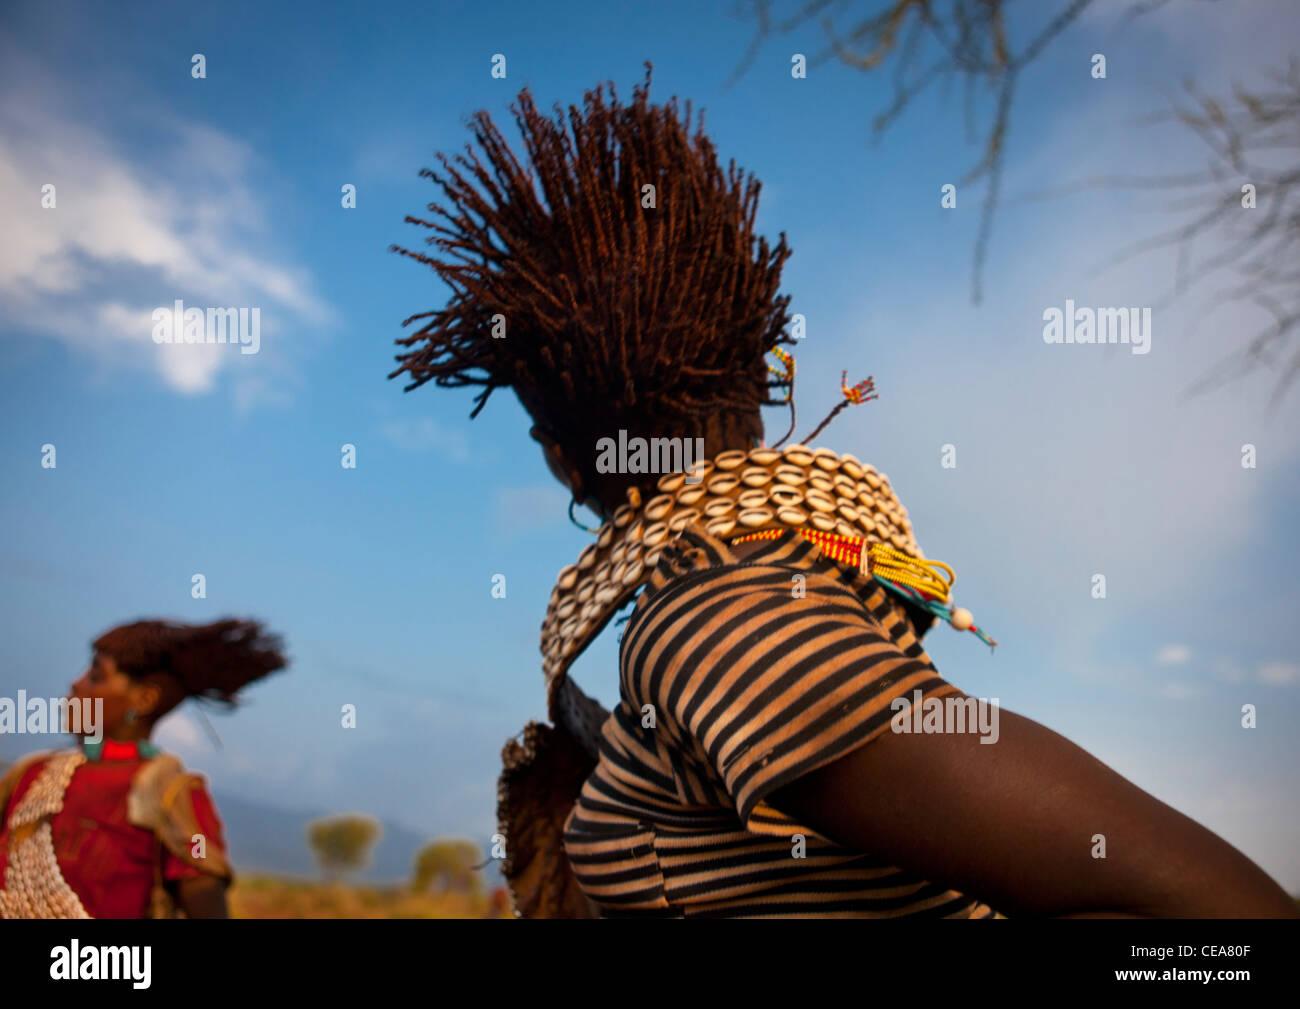 Banna Mujer agitando su cabello Bull Jumping ceremonia Etiopía Imagen De Stock